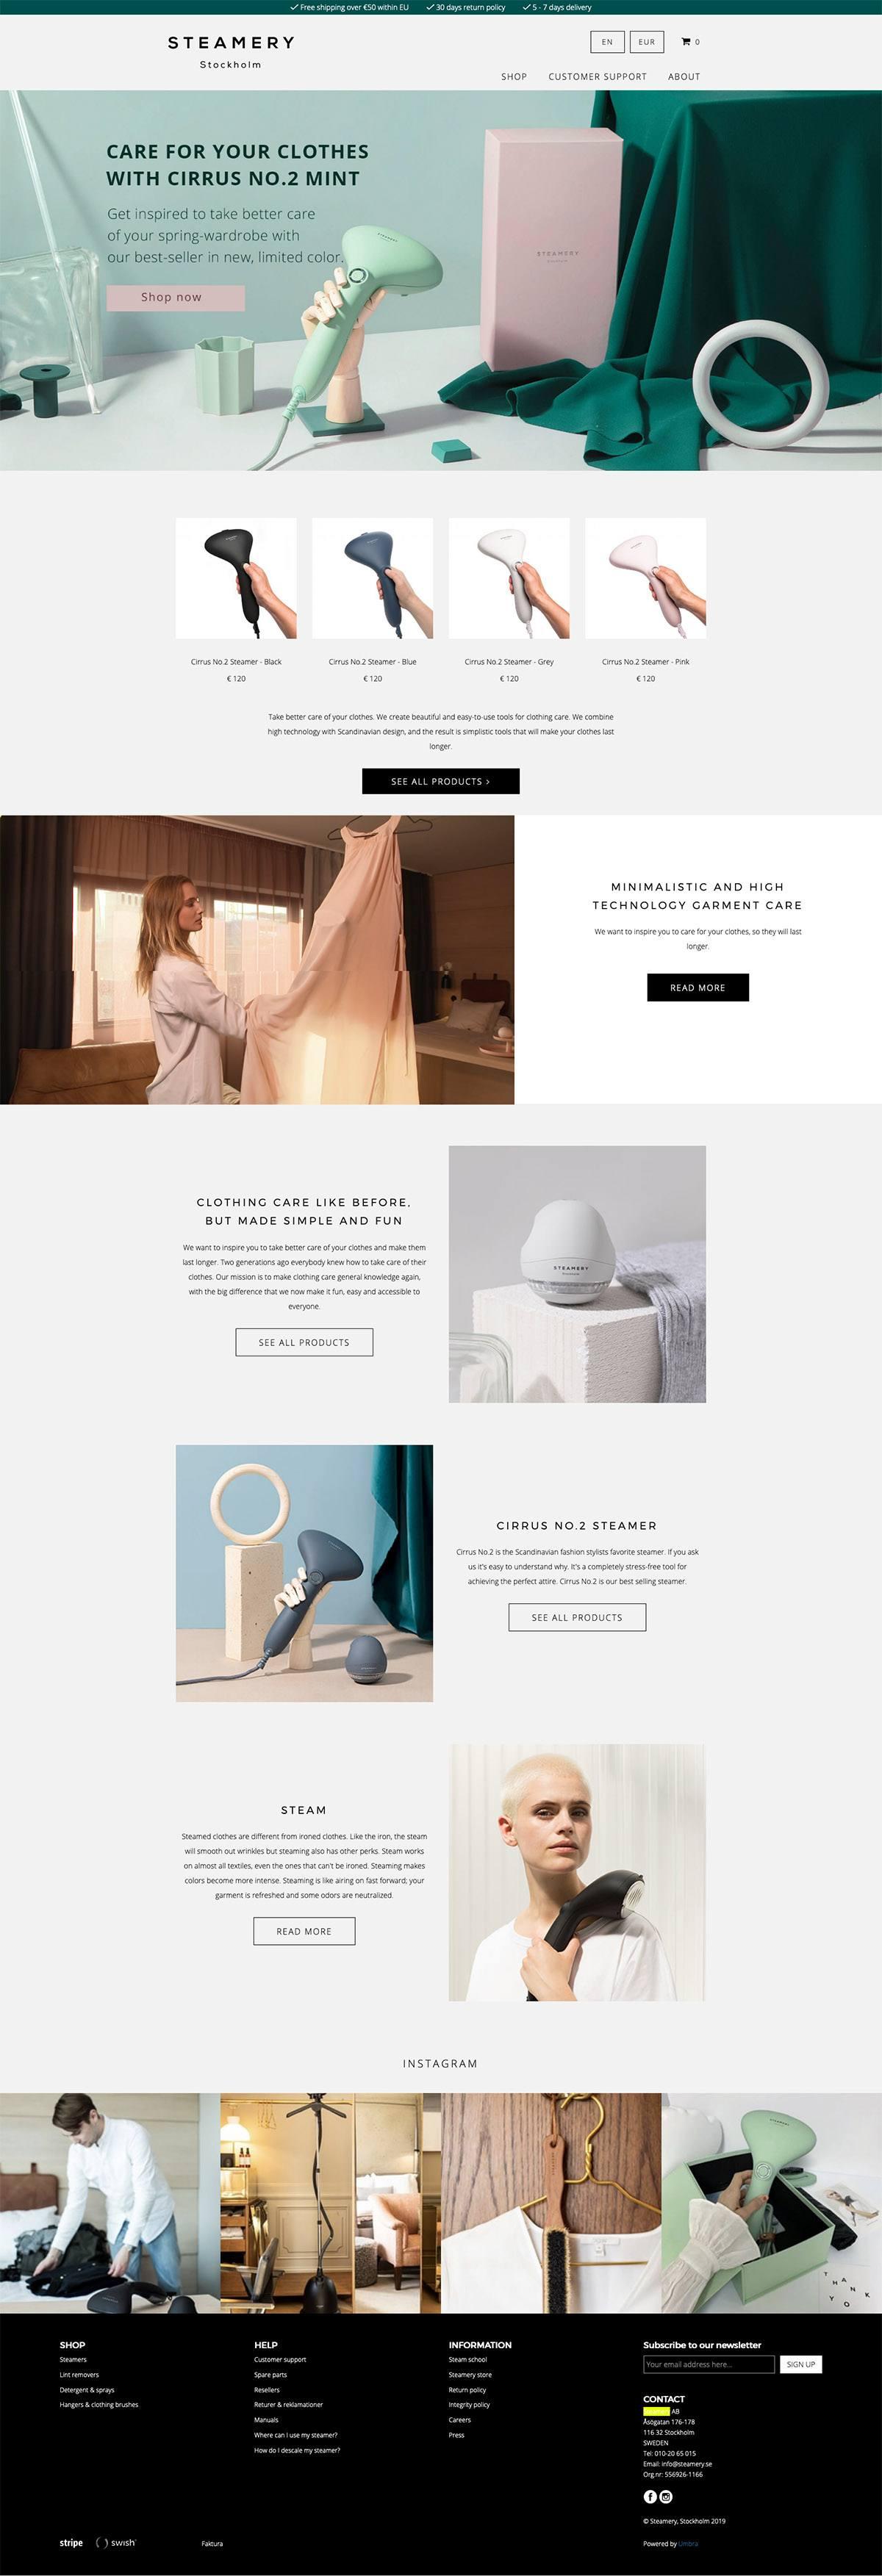 eCommerce website: Steamery